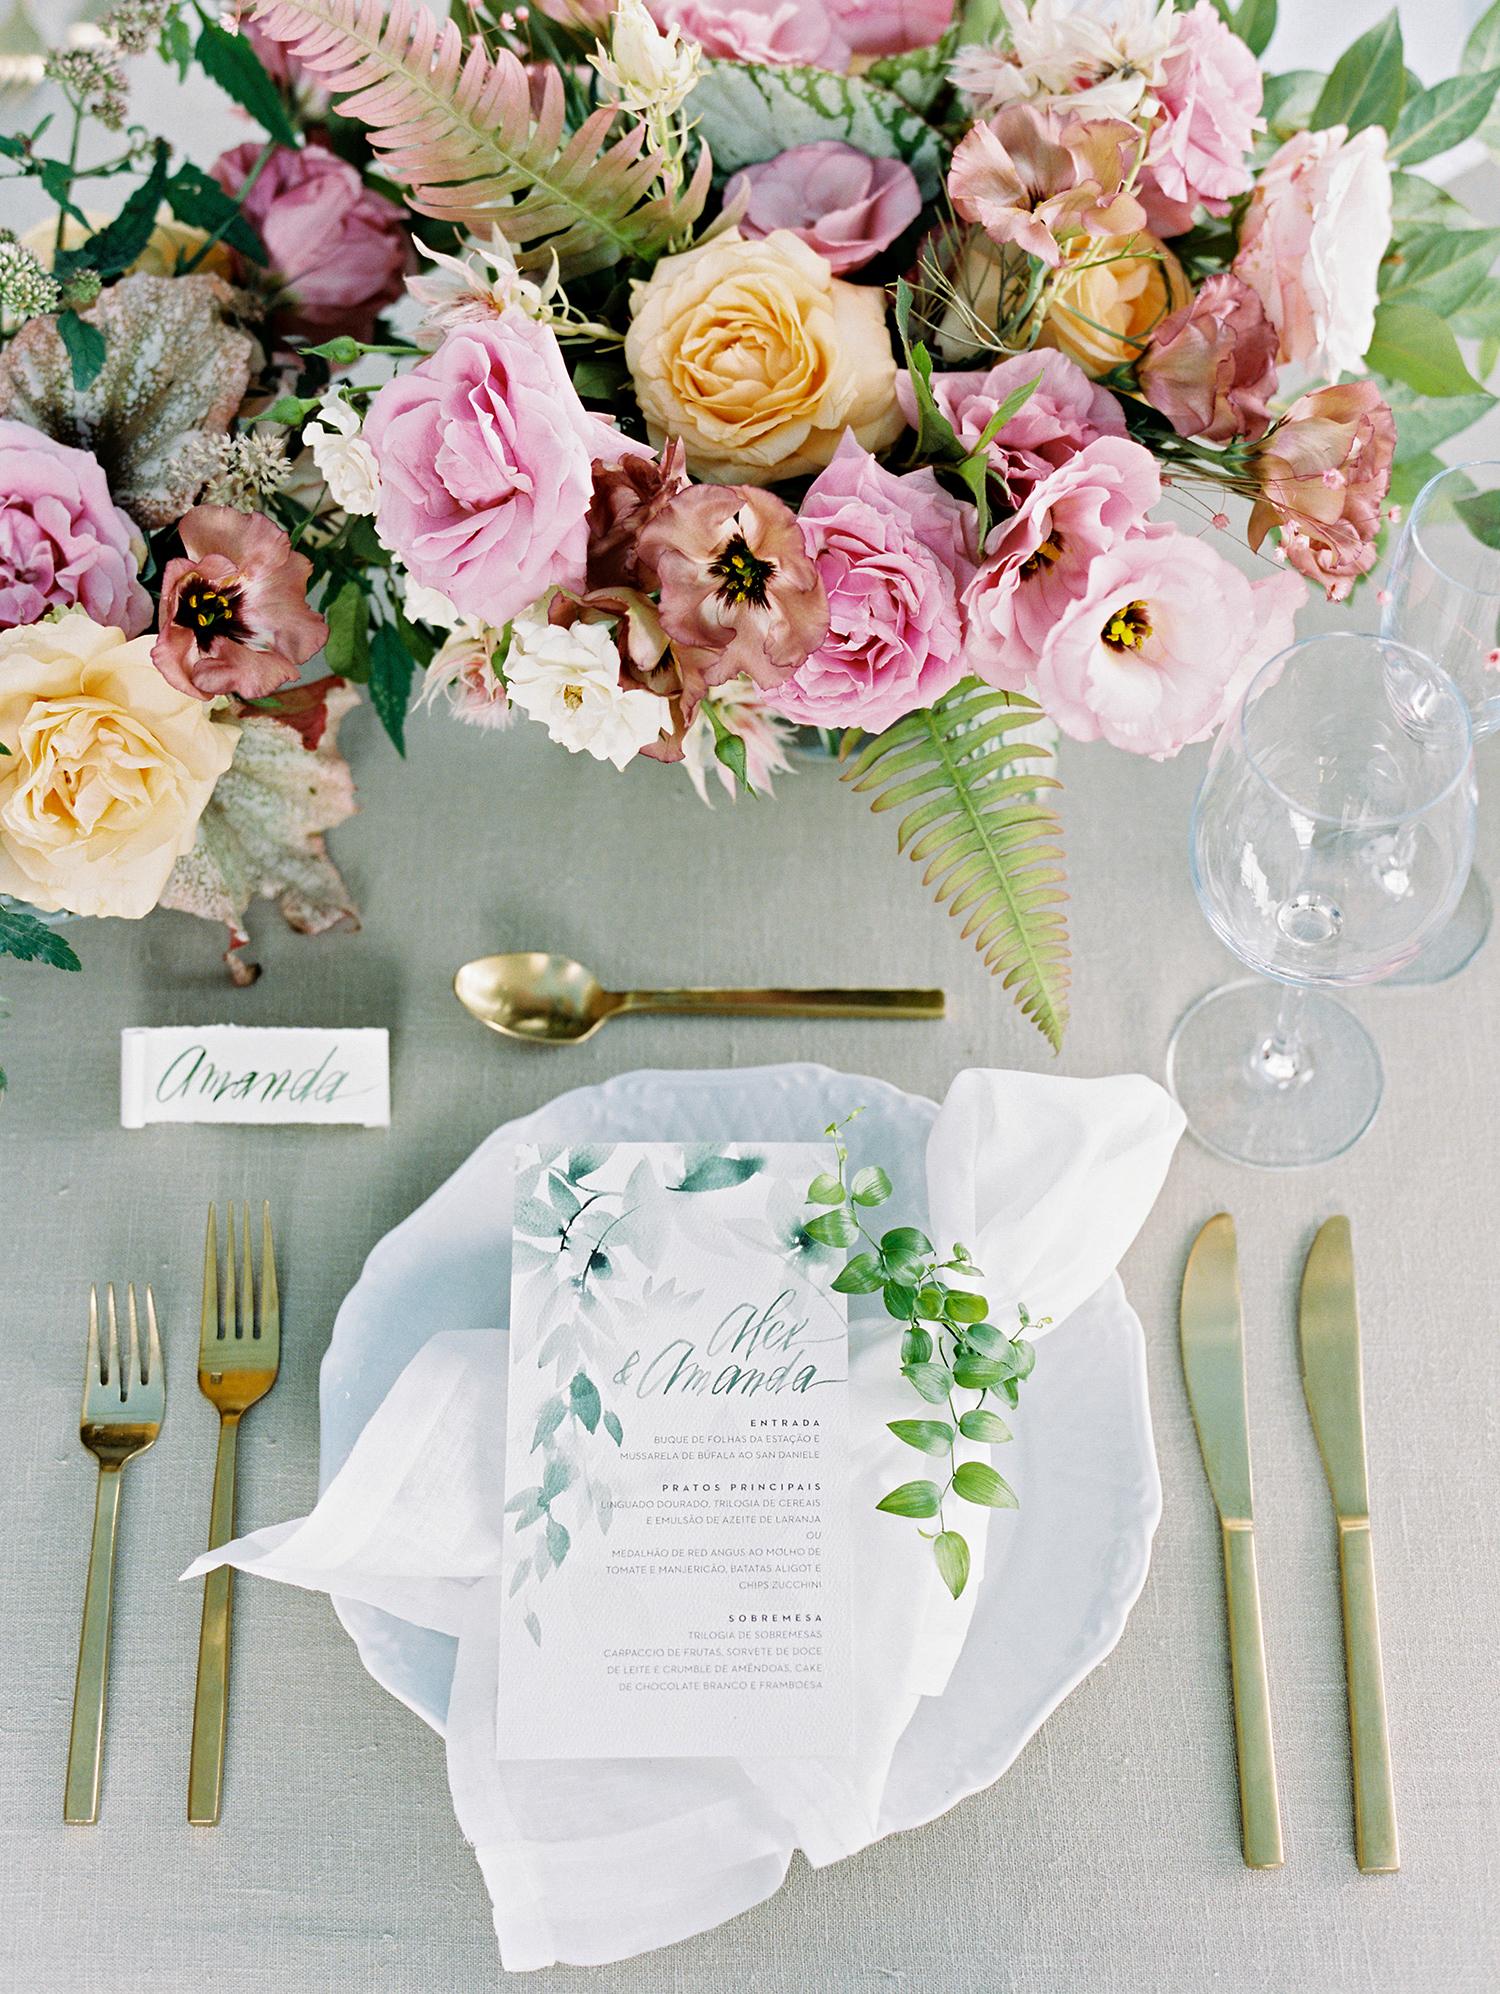 amanda alex wedding placesetting and centerpiece